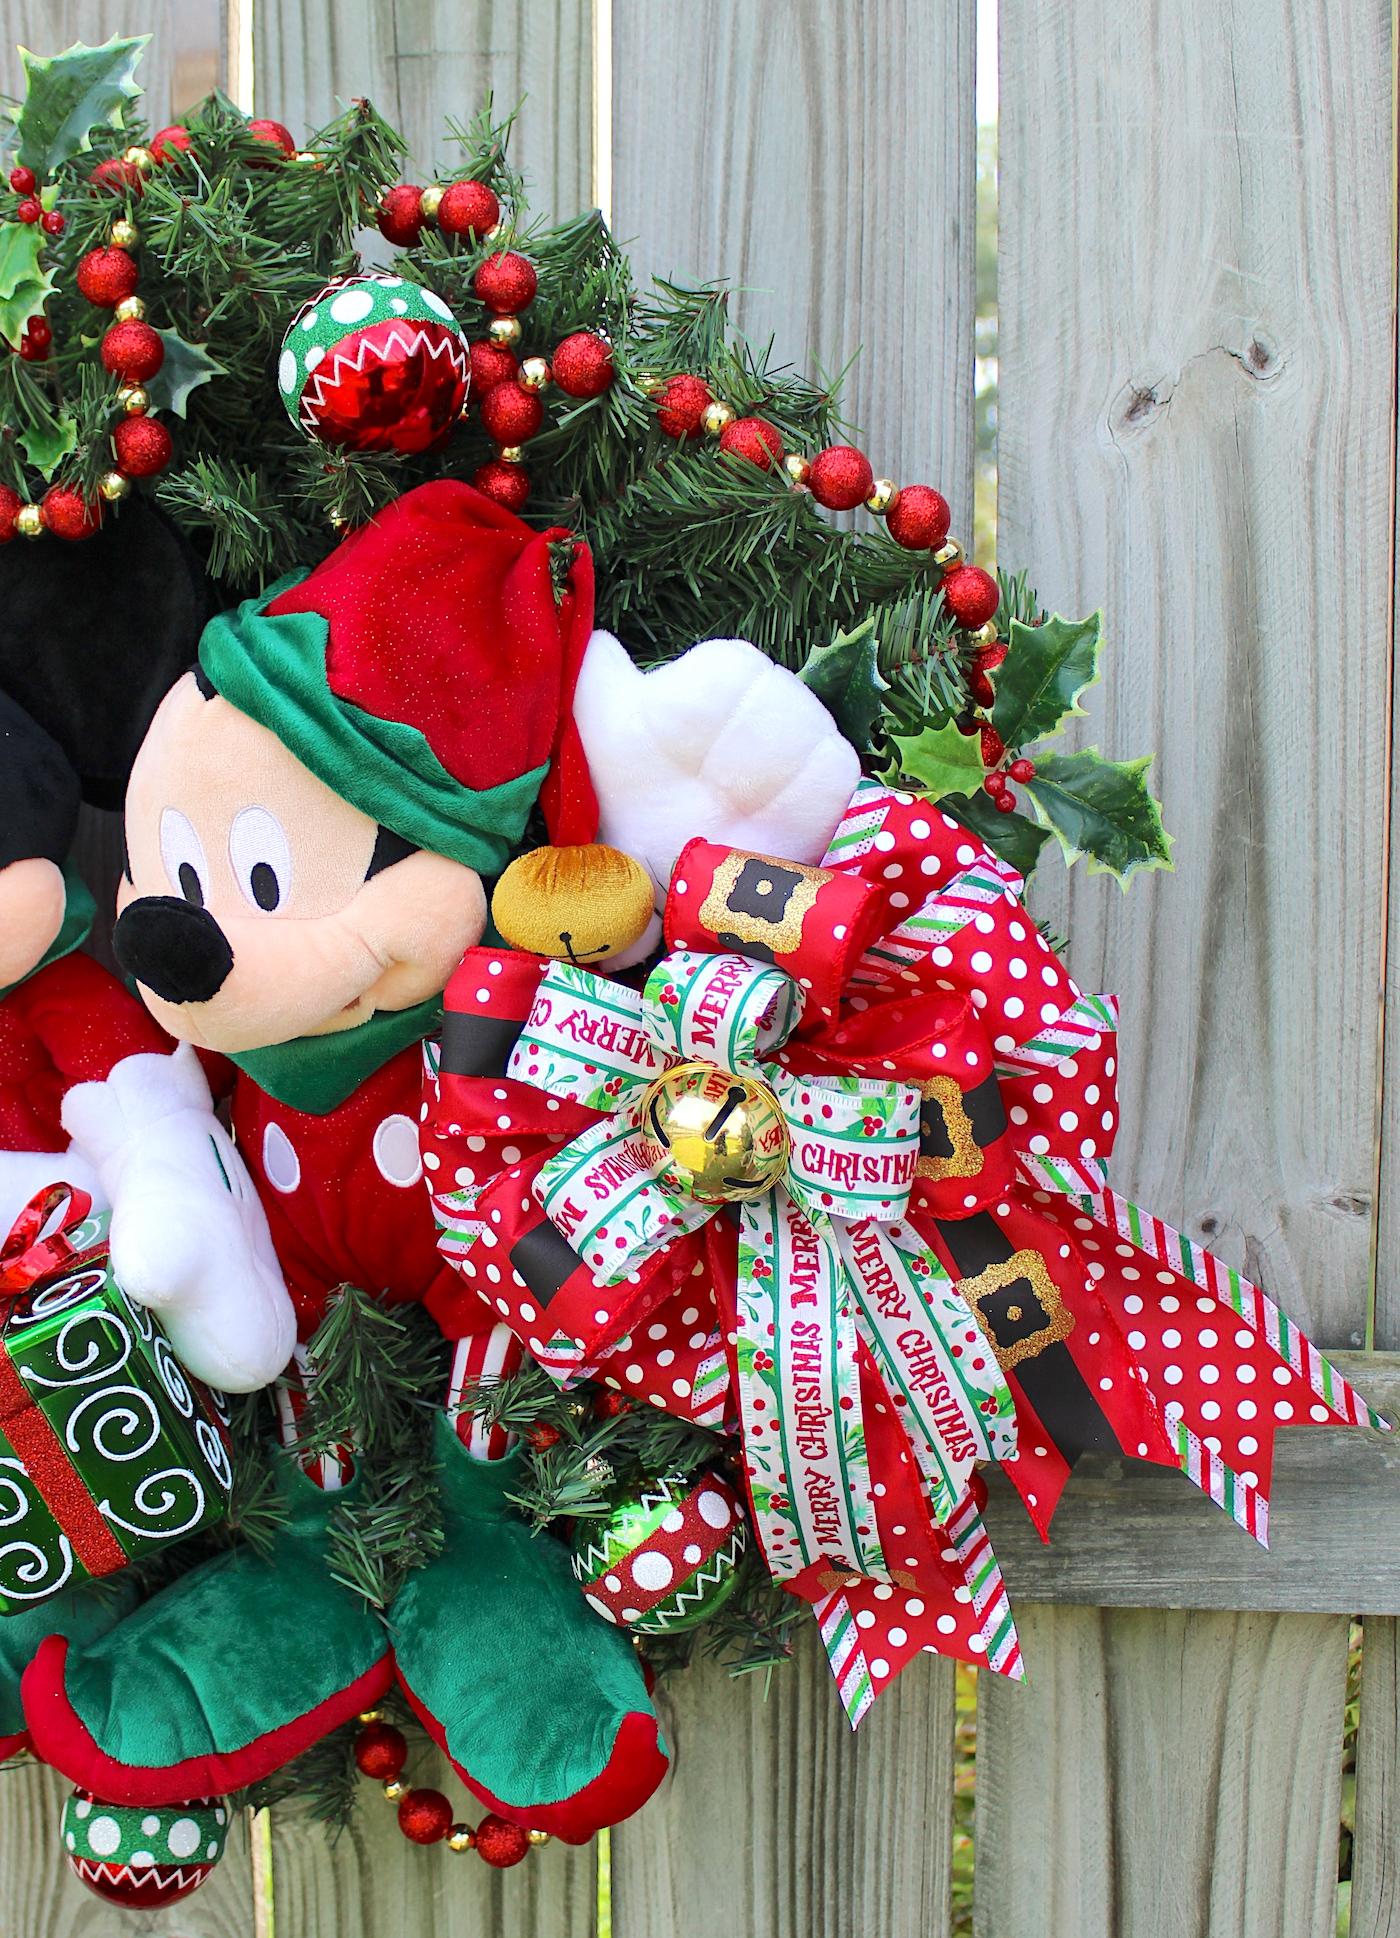 mickey and minnie mouse merry christmas wreath disney christmas santas helper elves sleigh bells